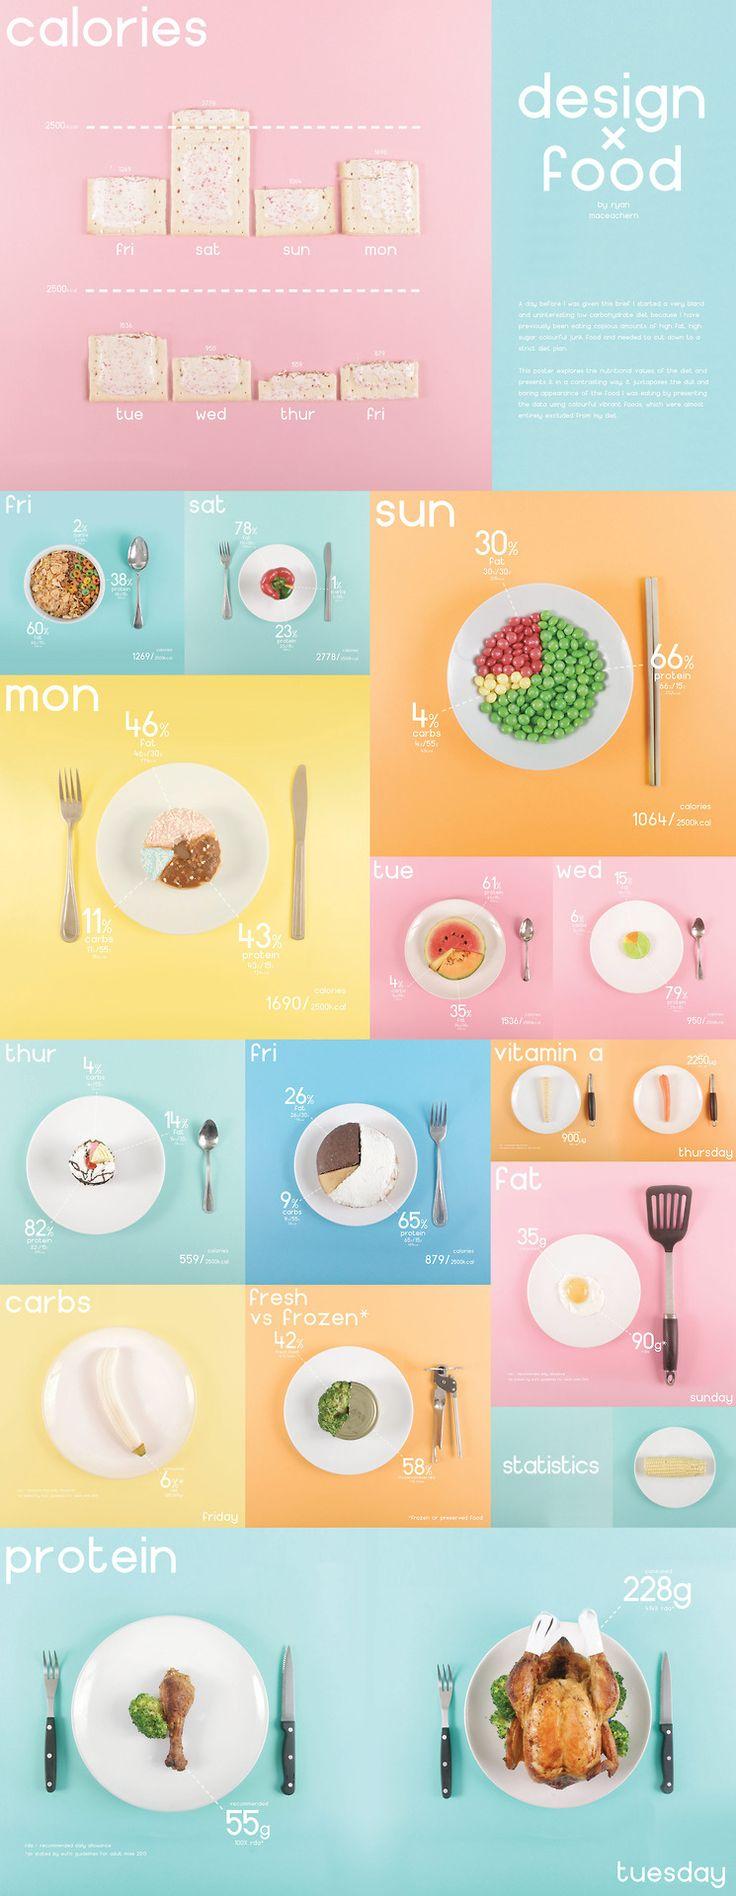 [Infographic] Design x Food